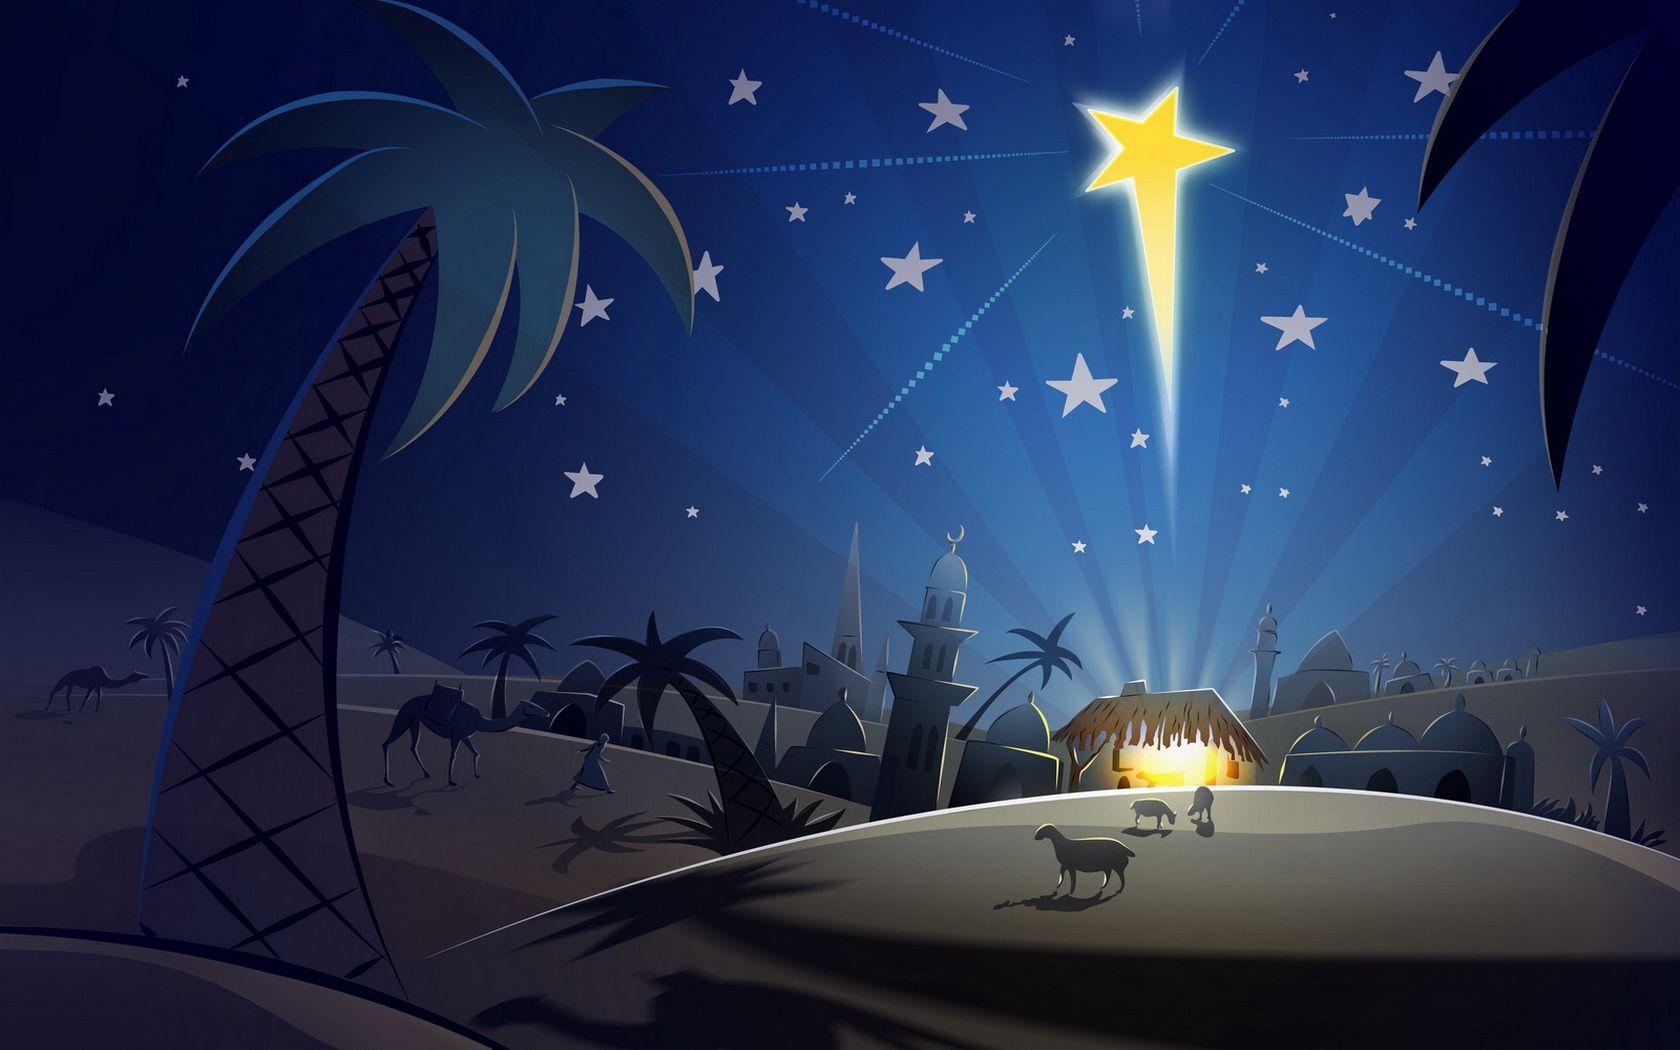 Over 250 Christian Wallpapers Jesus Is Born Christmas Desktop Christmas Desktop Wallpaper Christmas Jesus